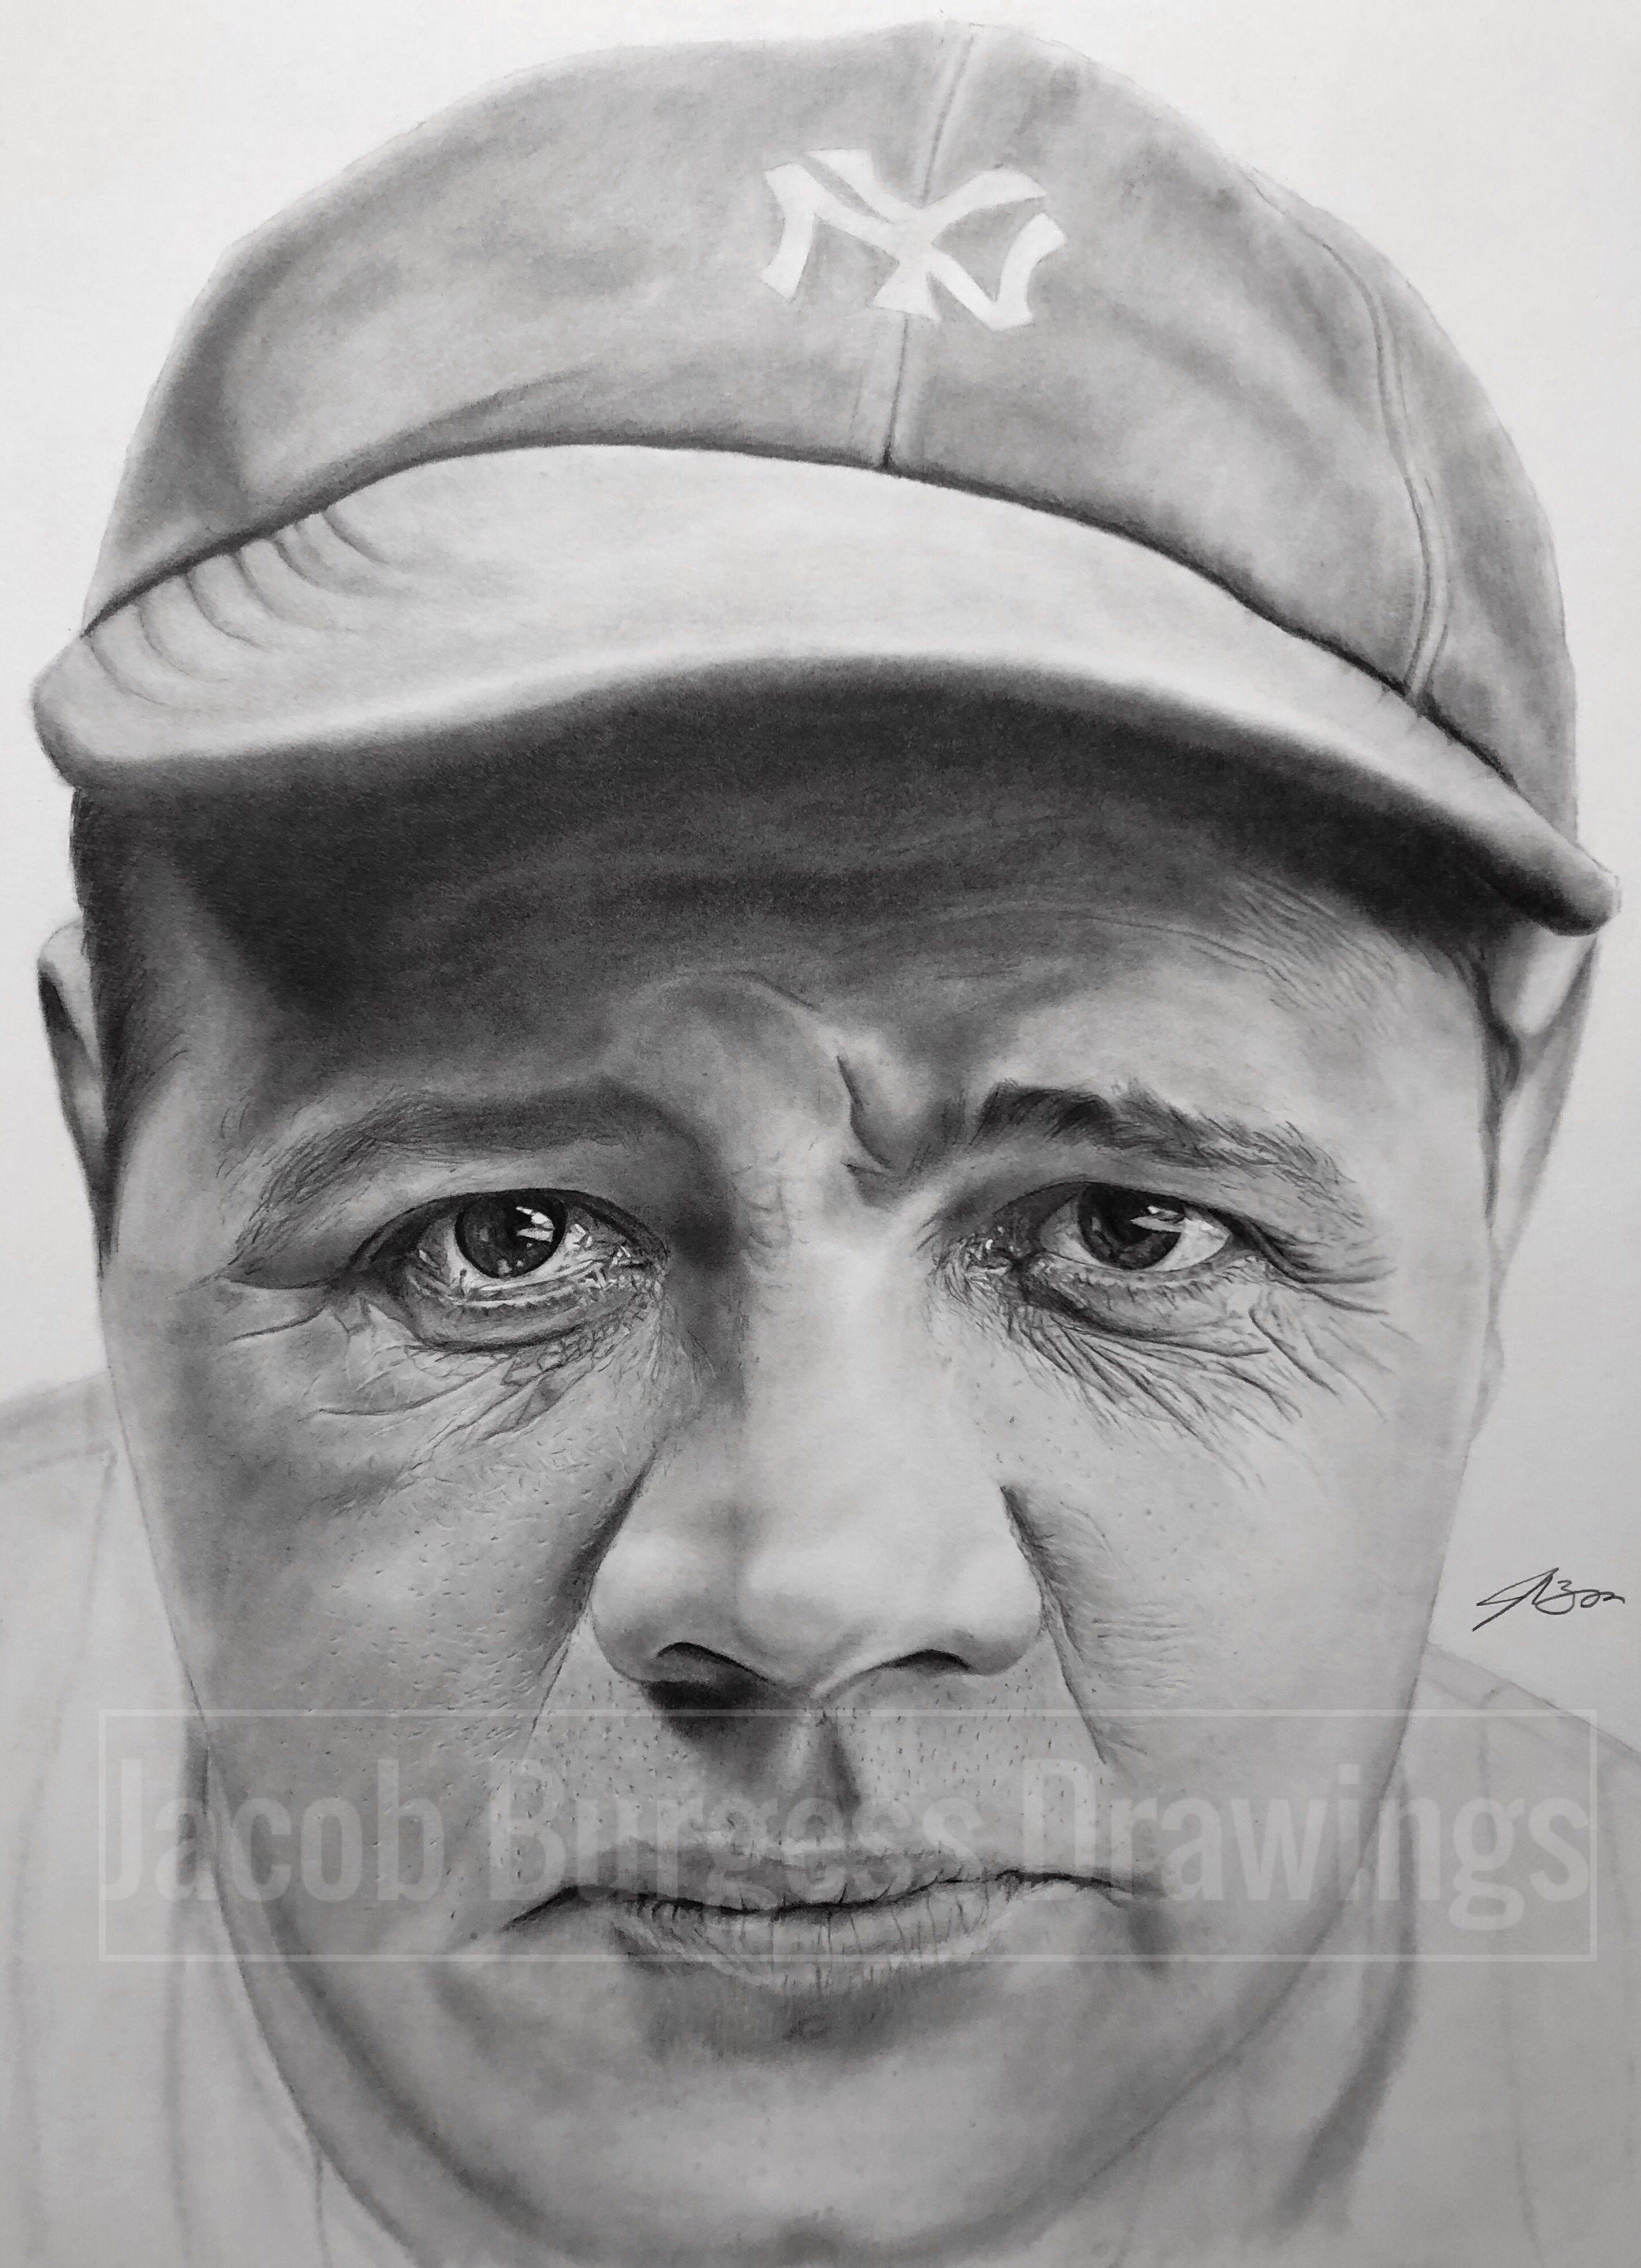 Babe Ruth 11 X14 Pencil Drawing Yankees Babe Ruth Pencil Drawings Drawings